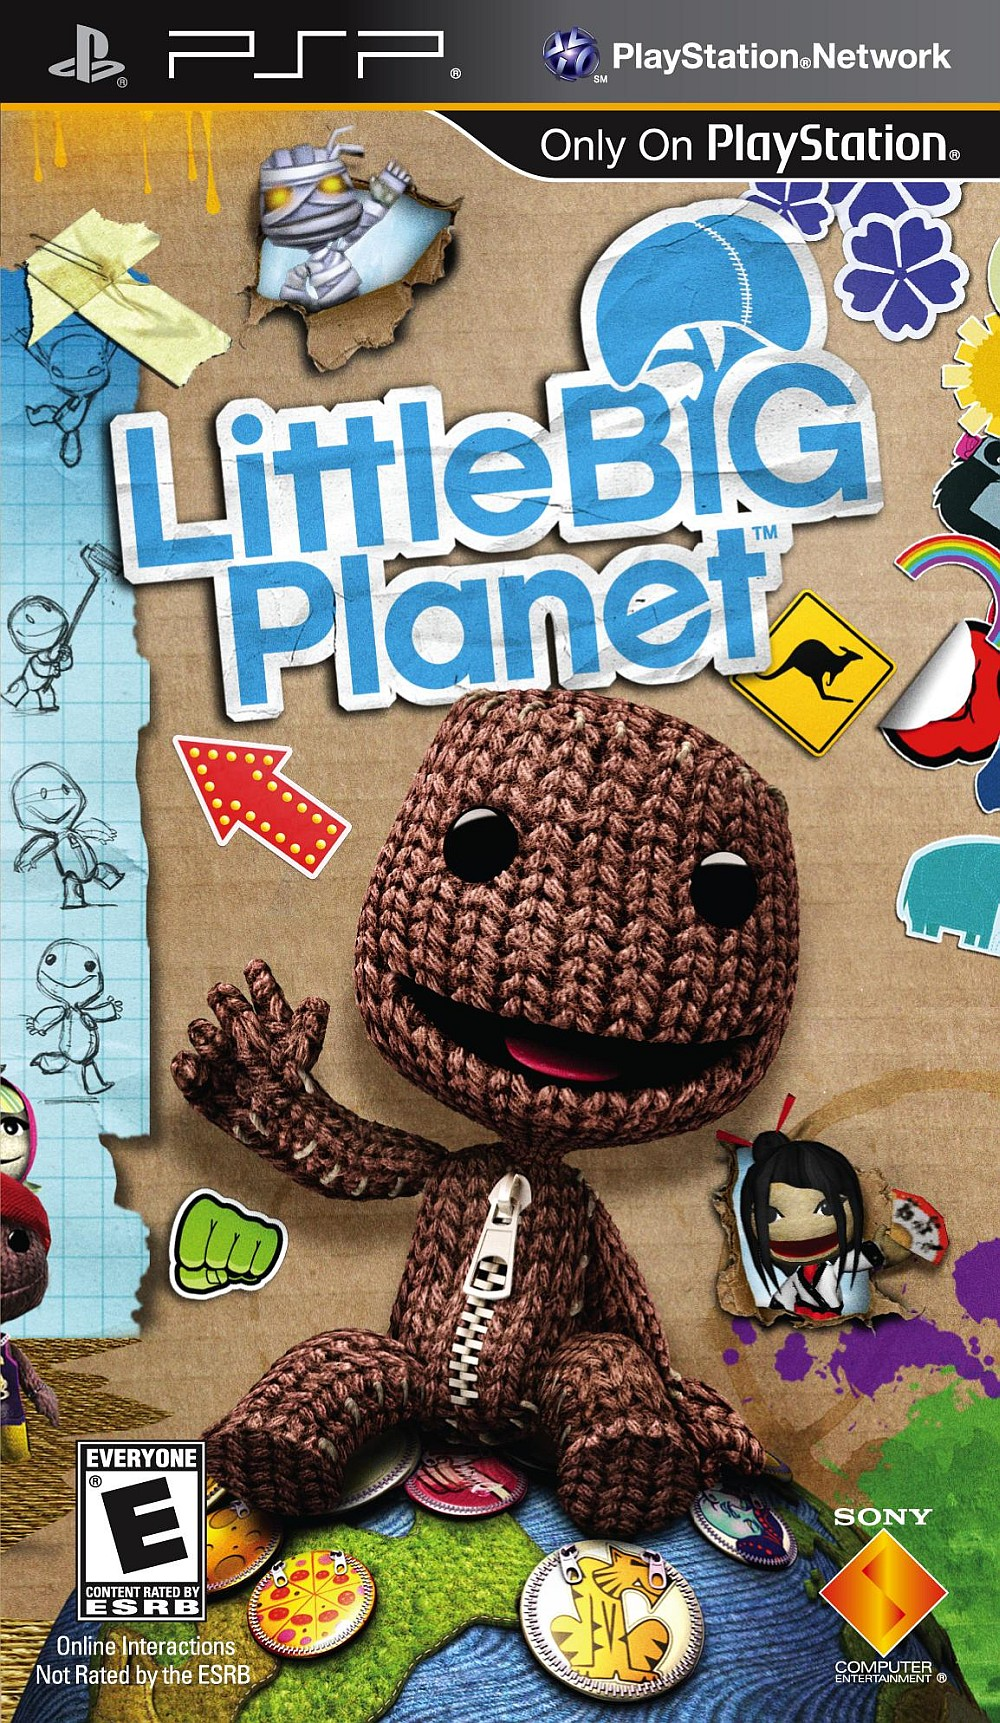 Little big planet psp hd wallpaper, background images.